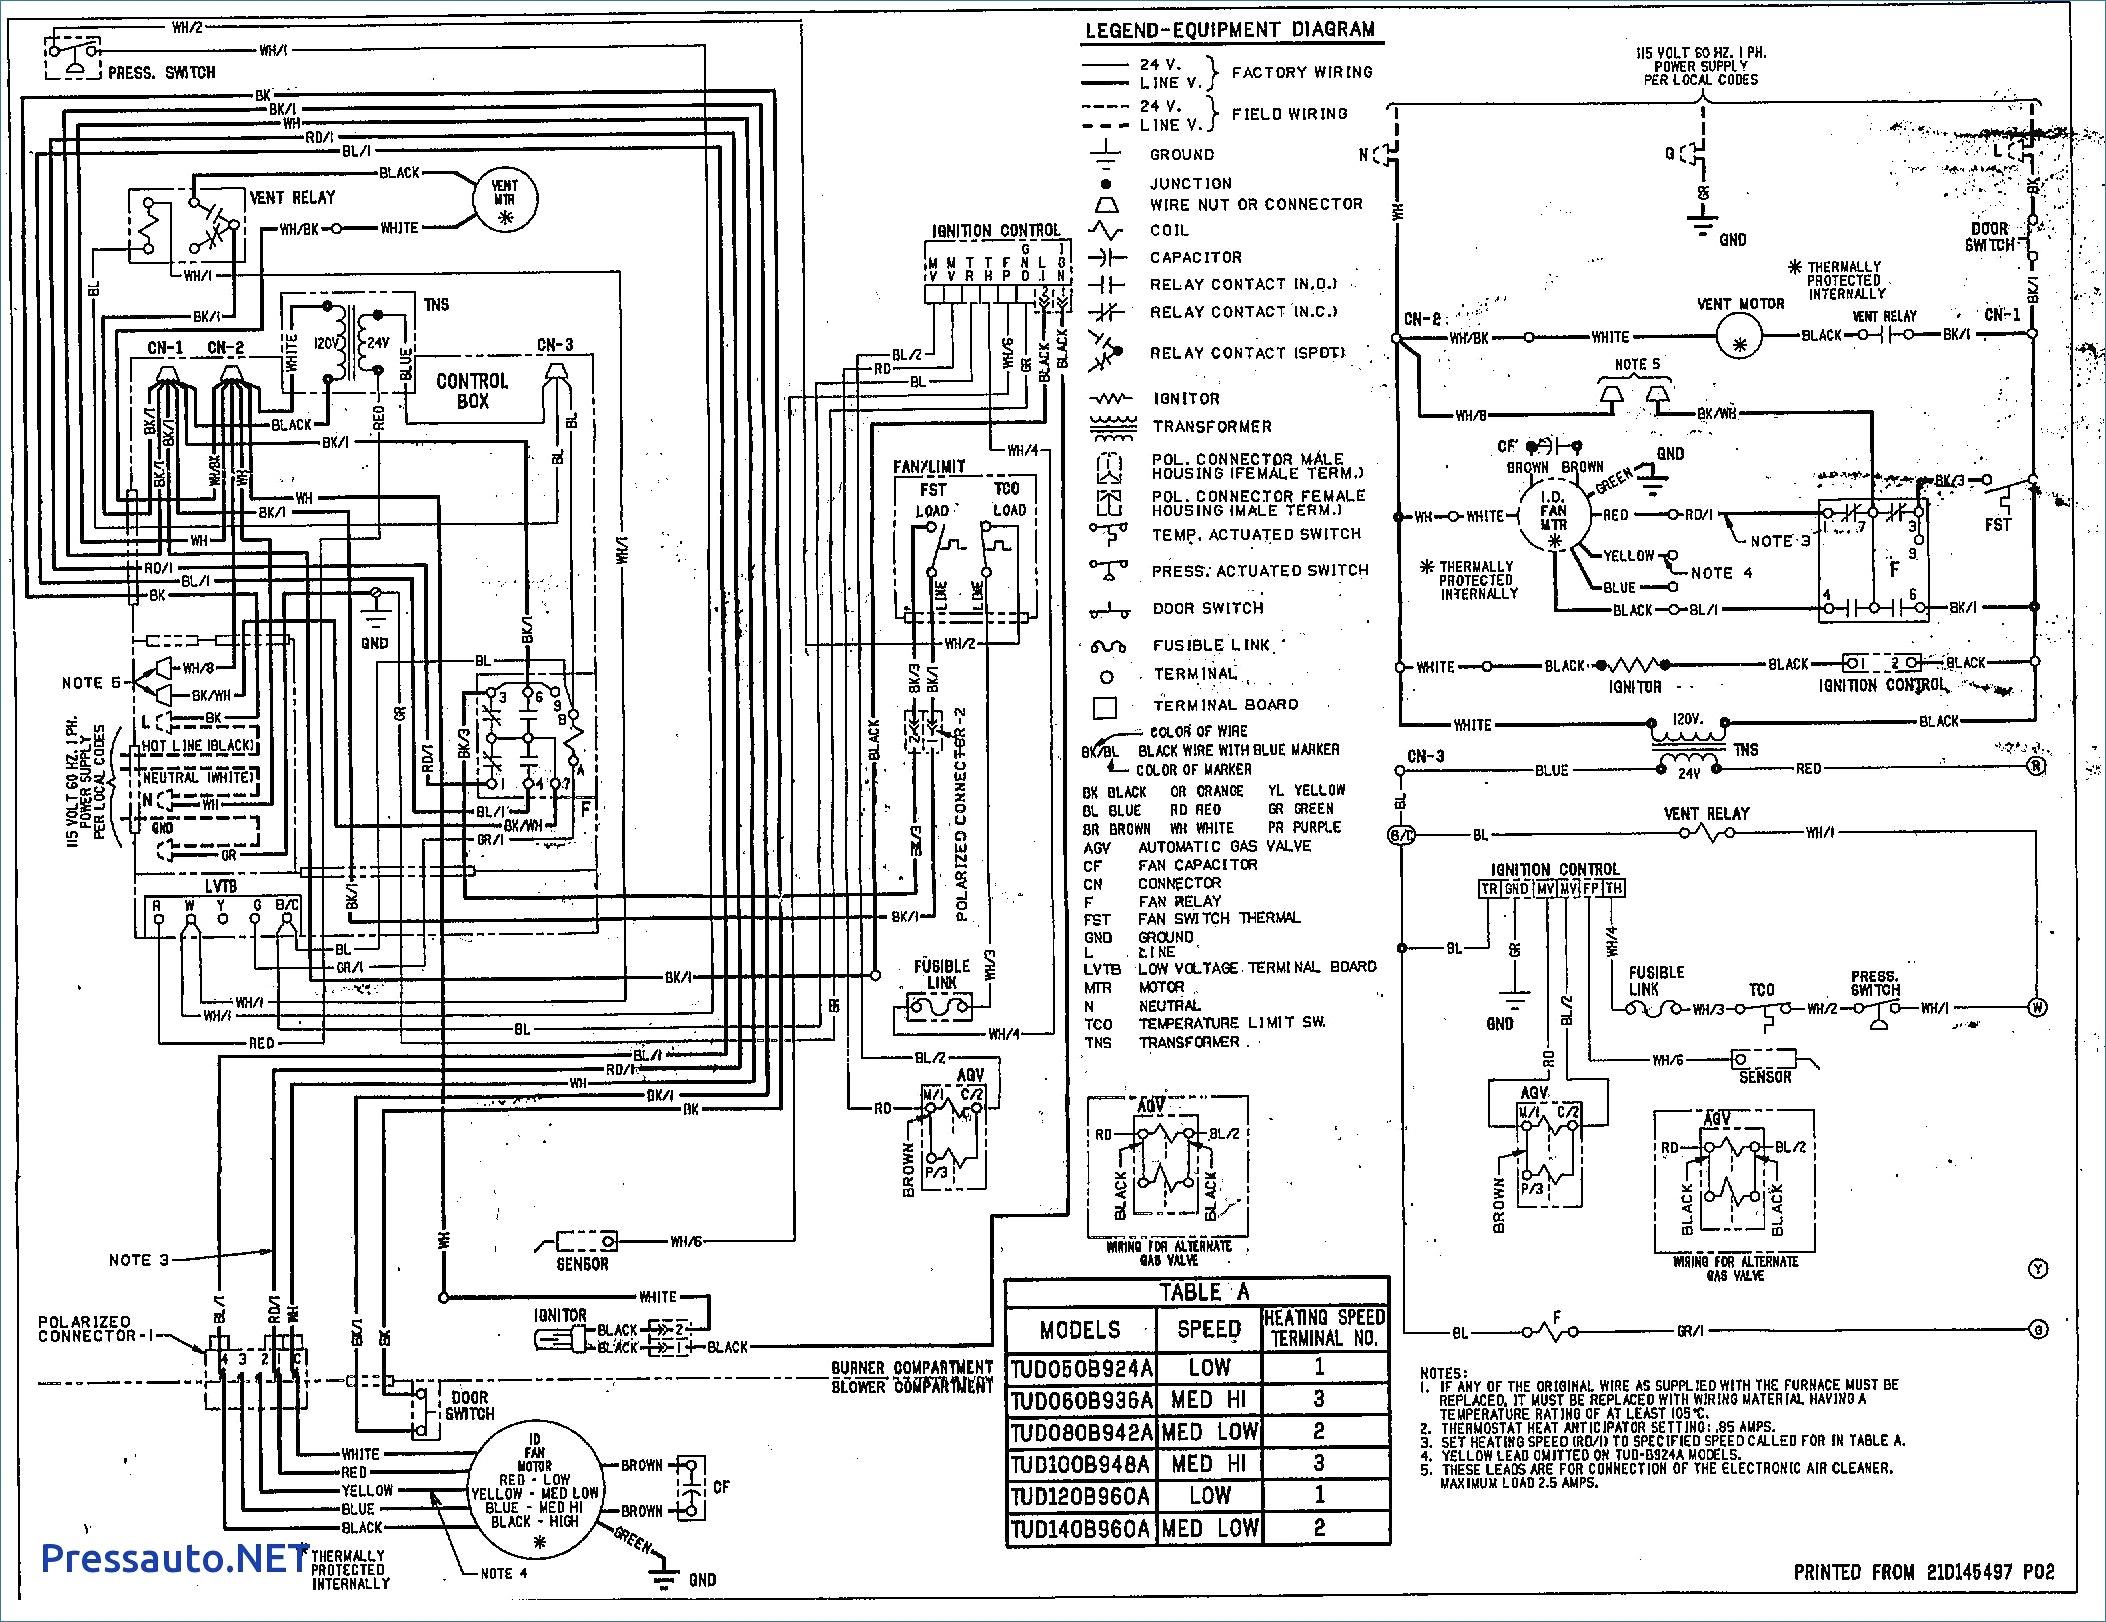 Coleman Mach Air Conditioner Wiring Diagram